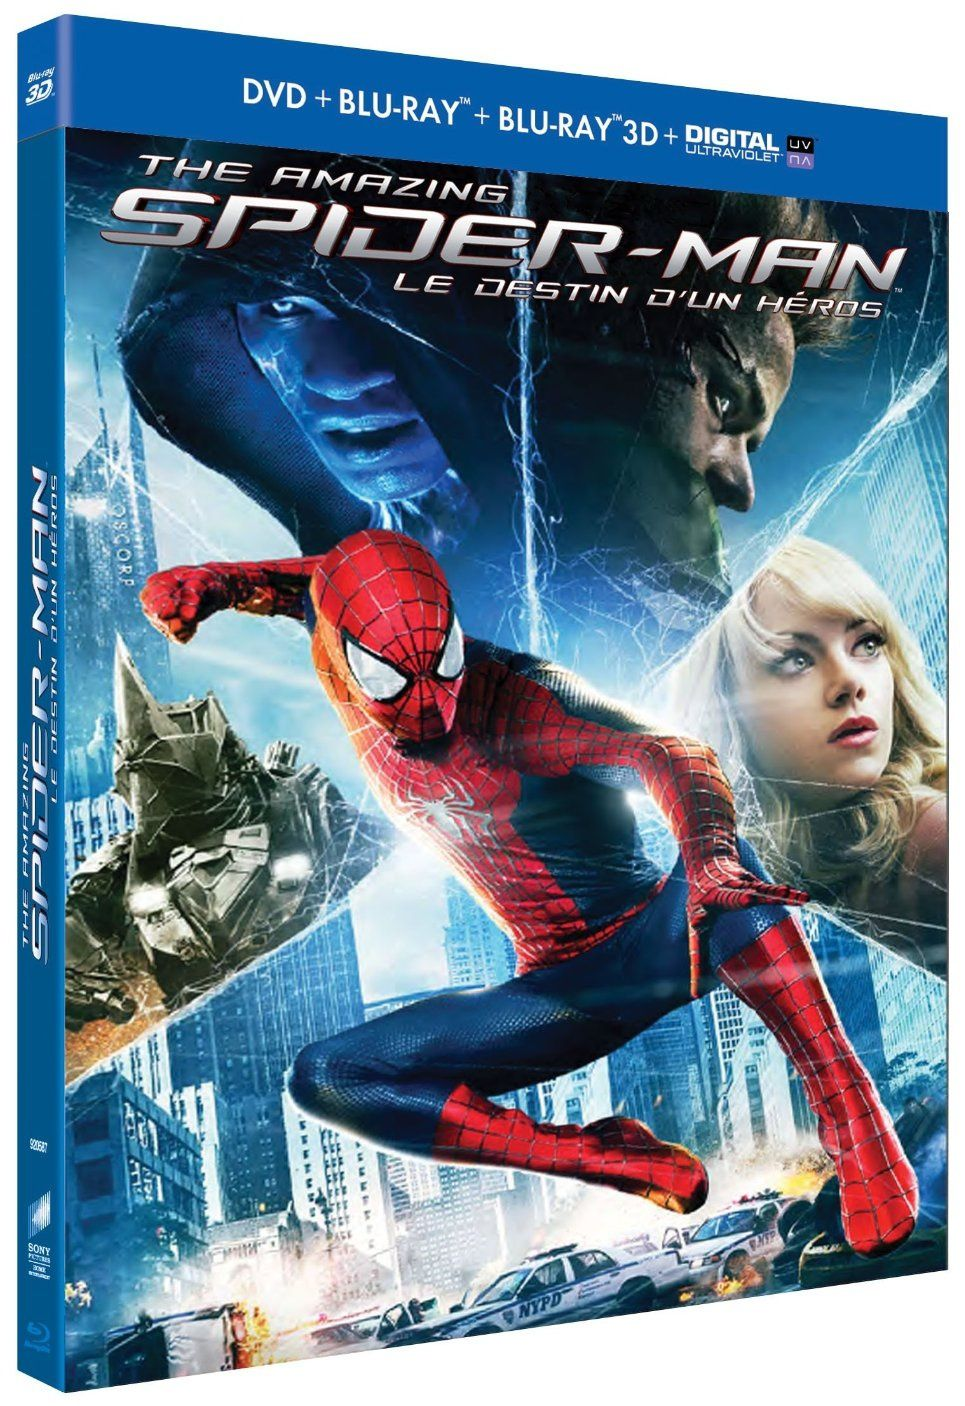 The amazing Spider-man 2, le destin d'un héros en dvd/blu-ray/digital ultraviolet